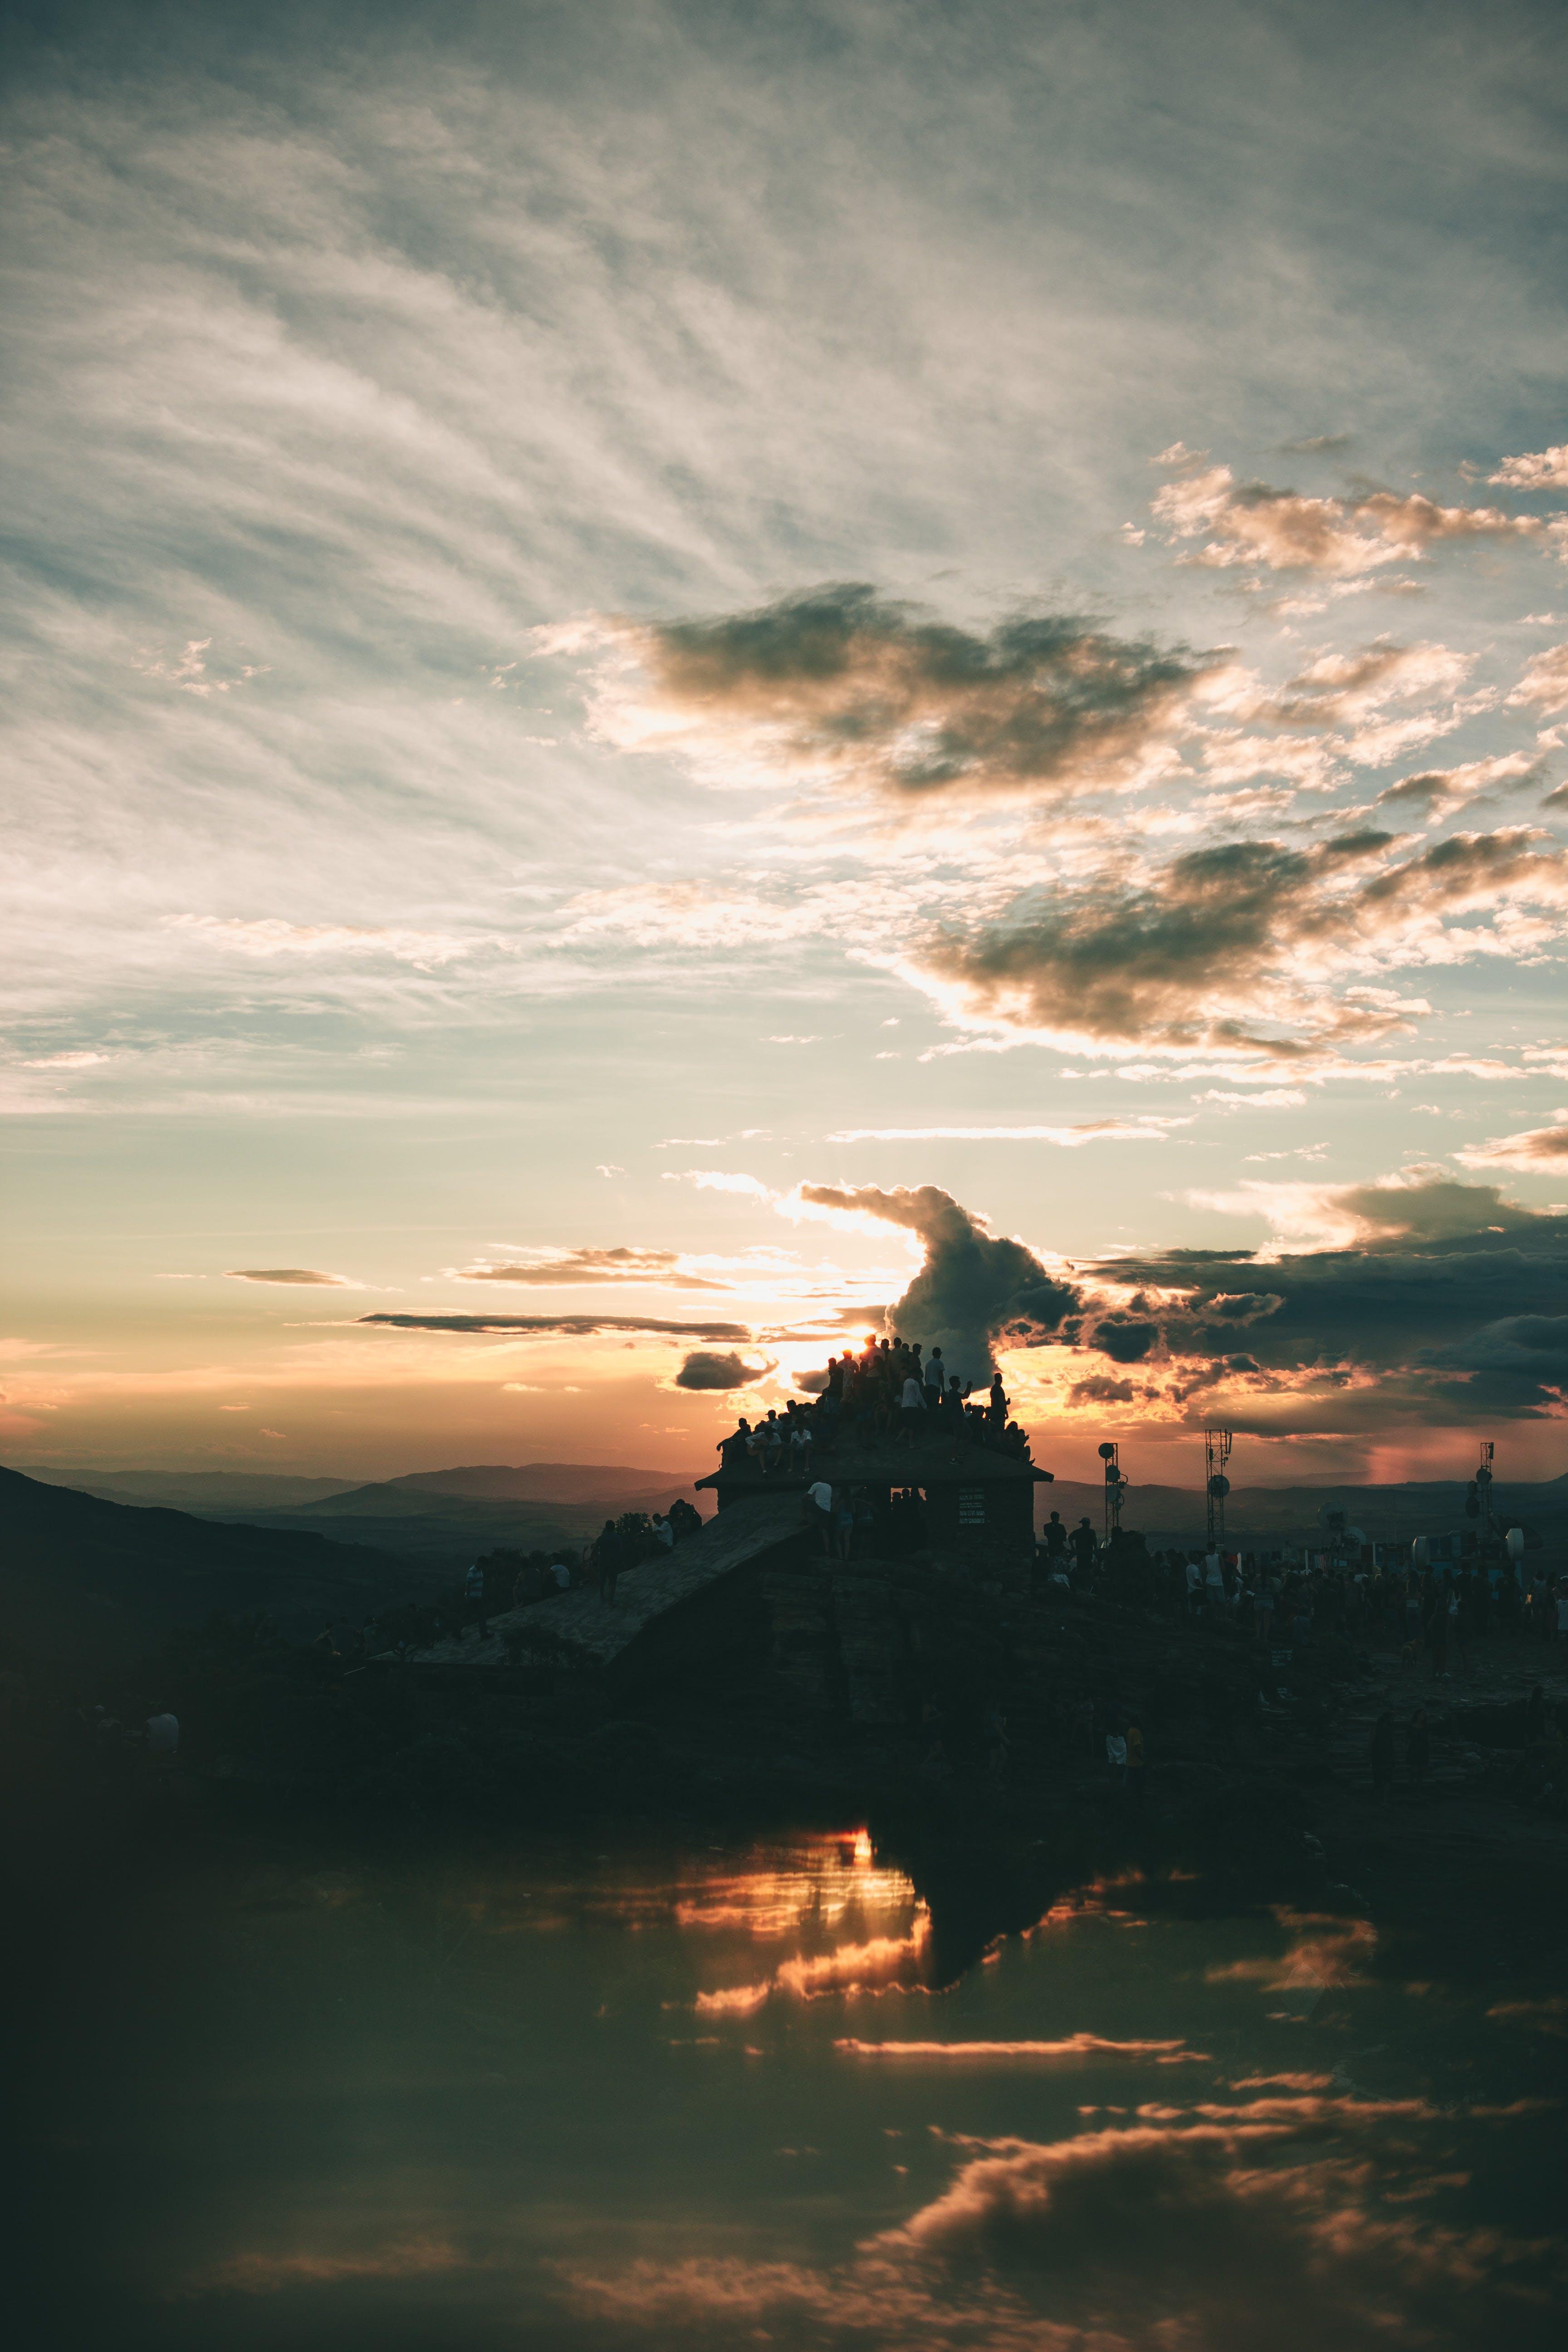 Kostnadsfri bild av apelsin, bakgrundsbelyst, dagsljus, gryning